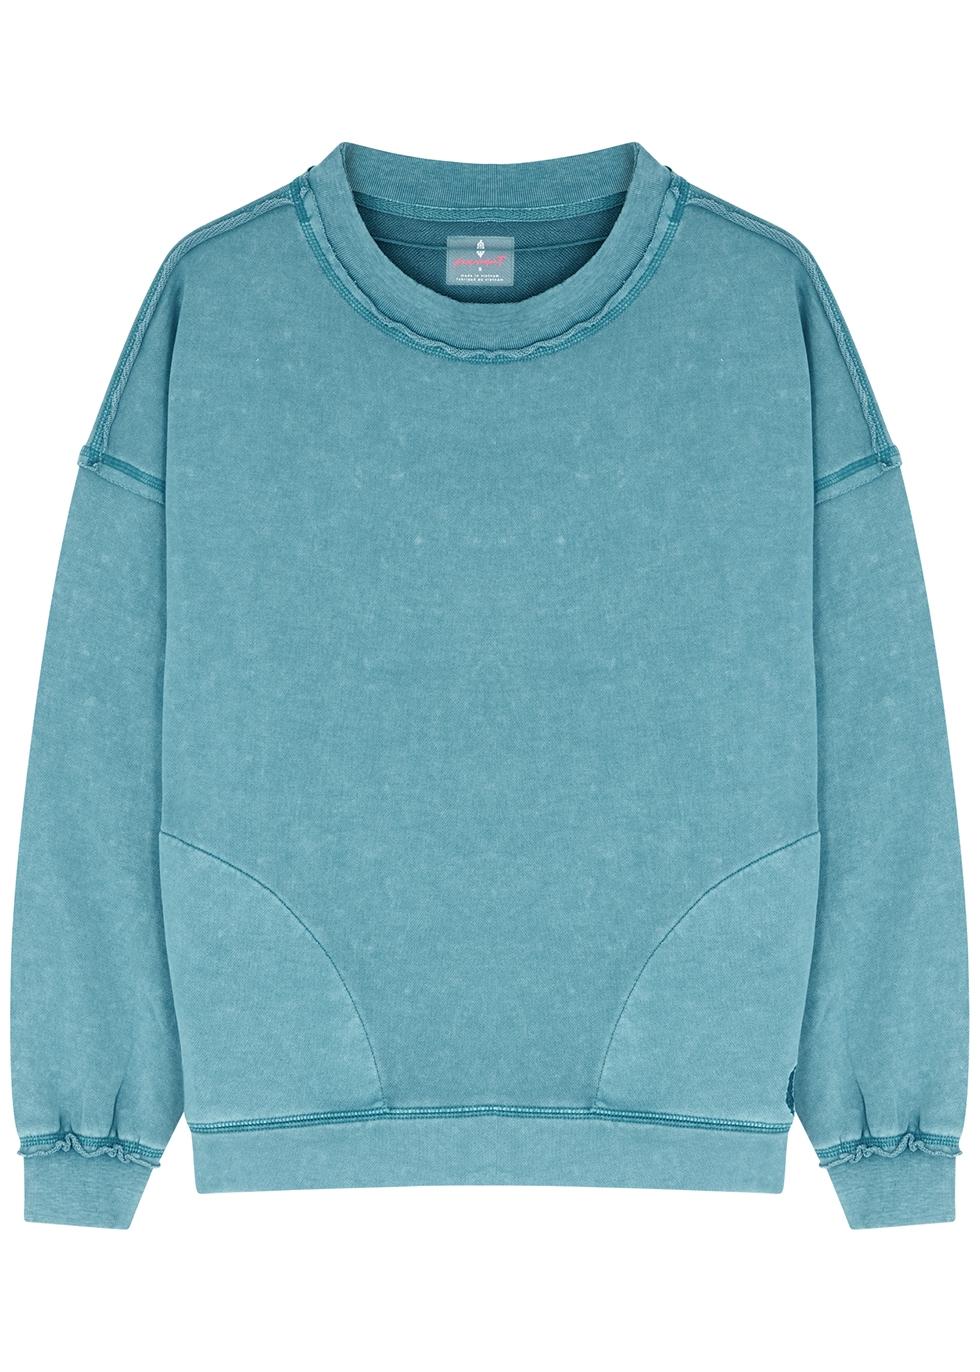 Solid Metti teal cotton-blend sweatshirt